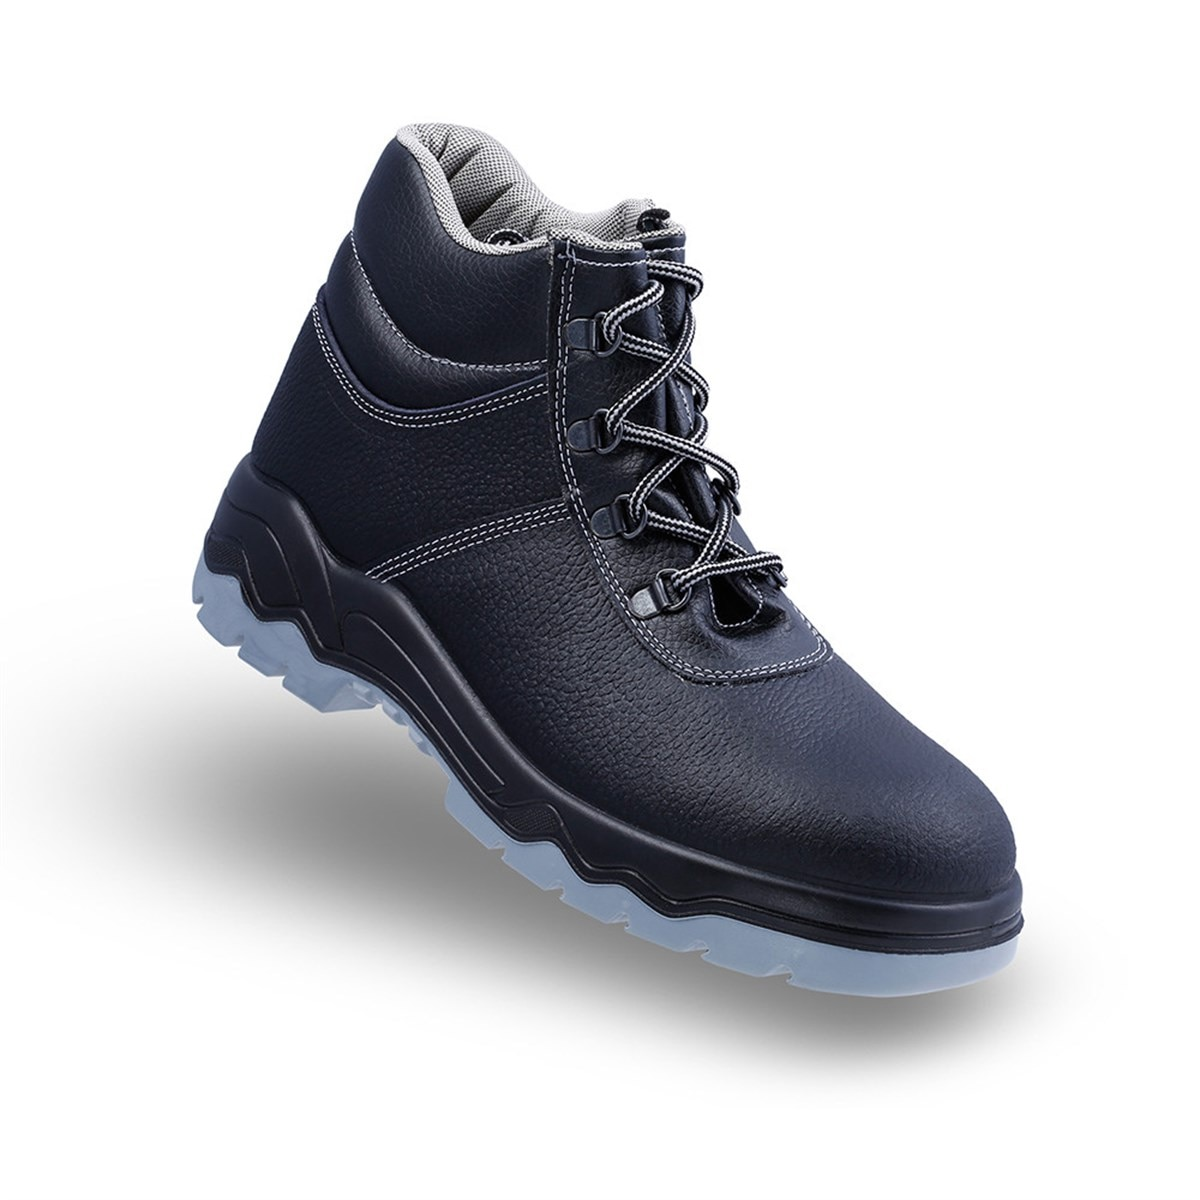 Mekap 072 S1 أحذية سلامة العمل والجلود ، أحذية أمان ، أحذية عمل ، أحذية عمل ، أحذية أمان ، src ، أحذية غير قابلة للانزلاق ، أحذية مقاومة